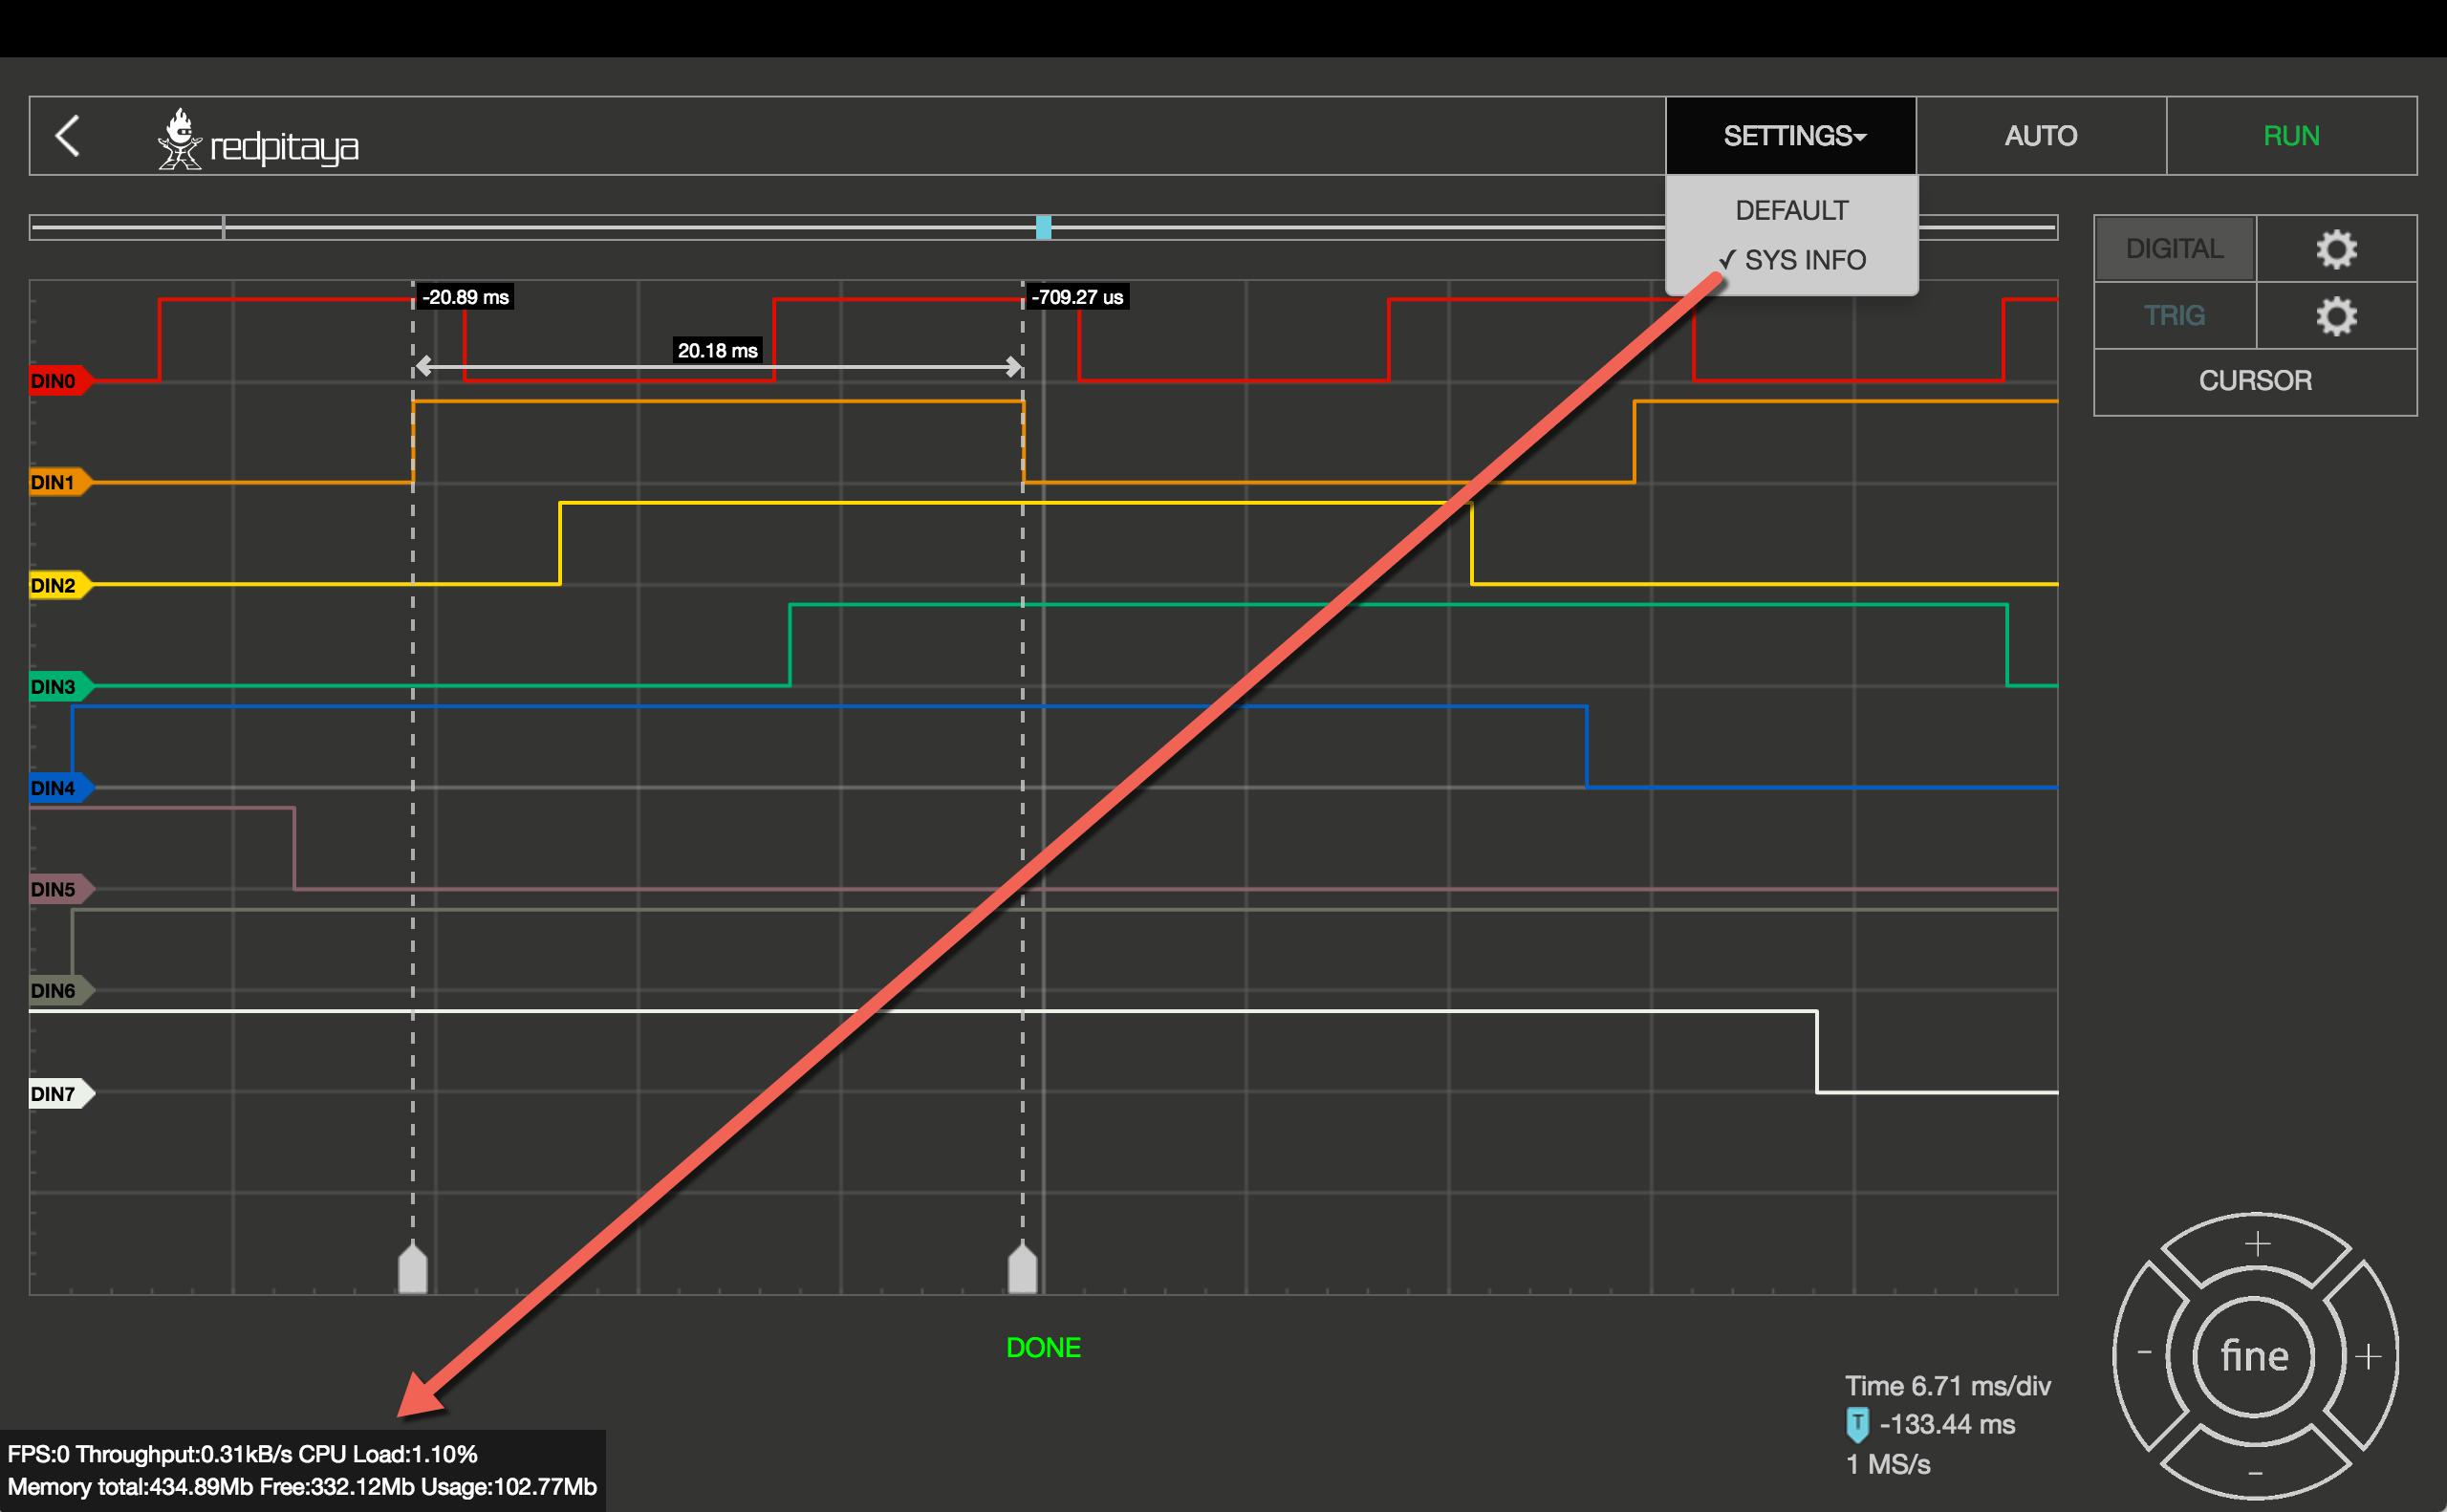 Red Pitaya Logic Analyzer App Hardware Indibit Diagram Sysinfo